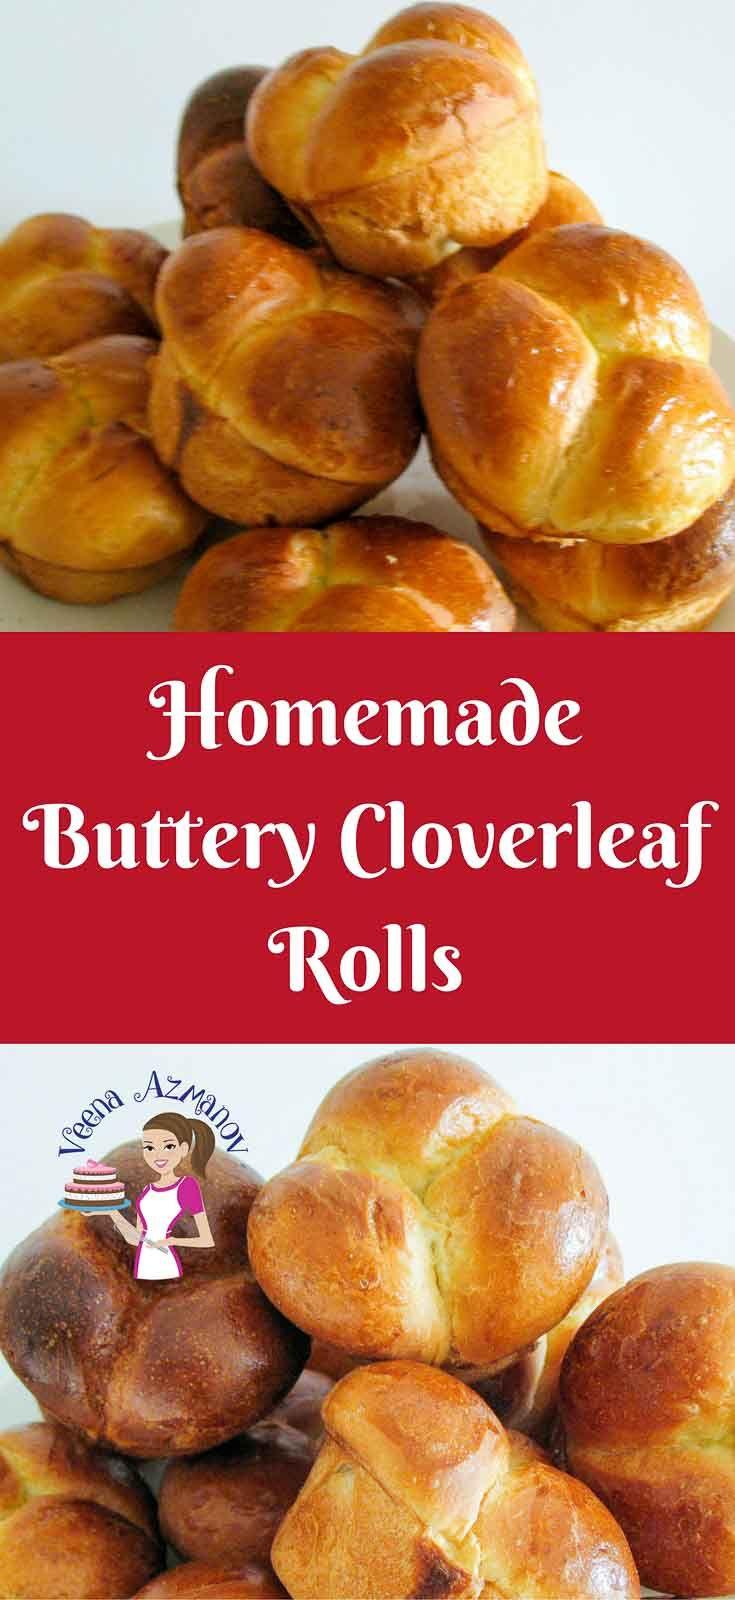 Homemade Buttery Cloverleaf Rolls via @Veenaazmanov